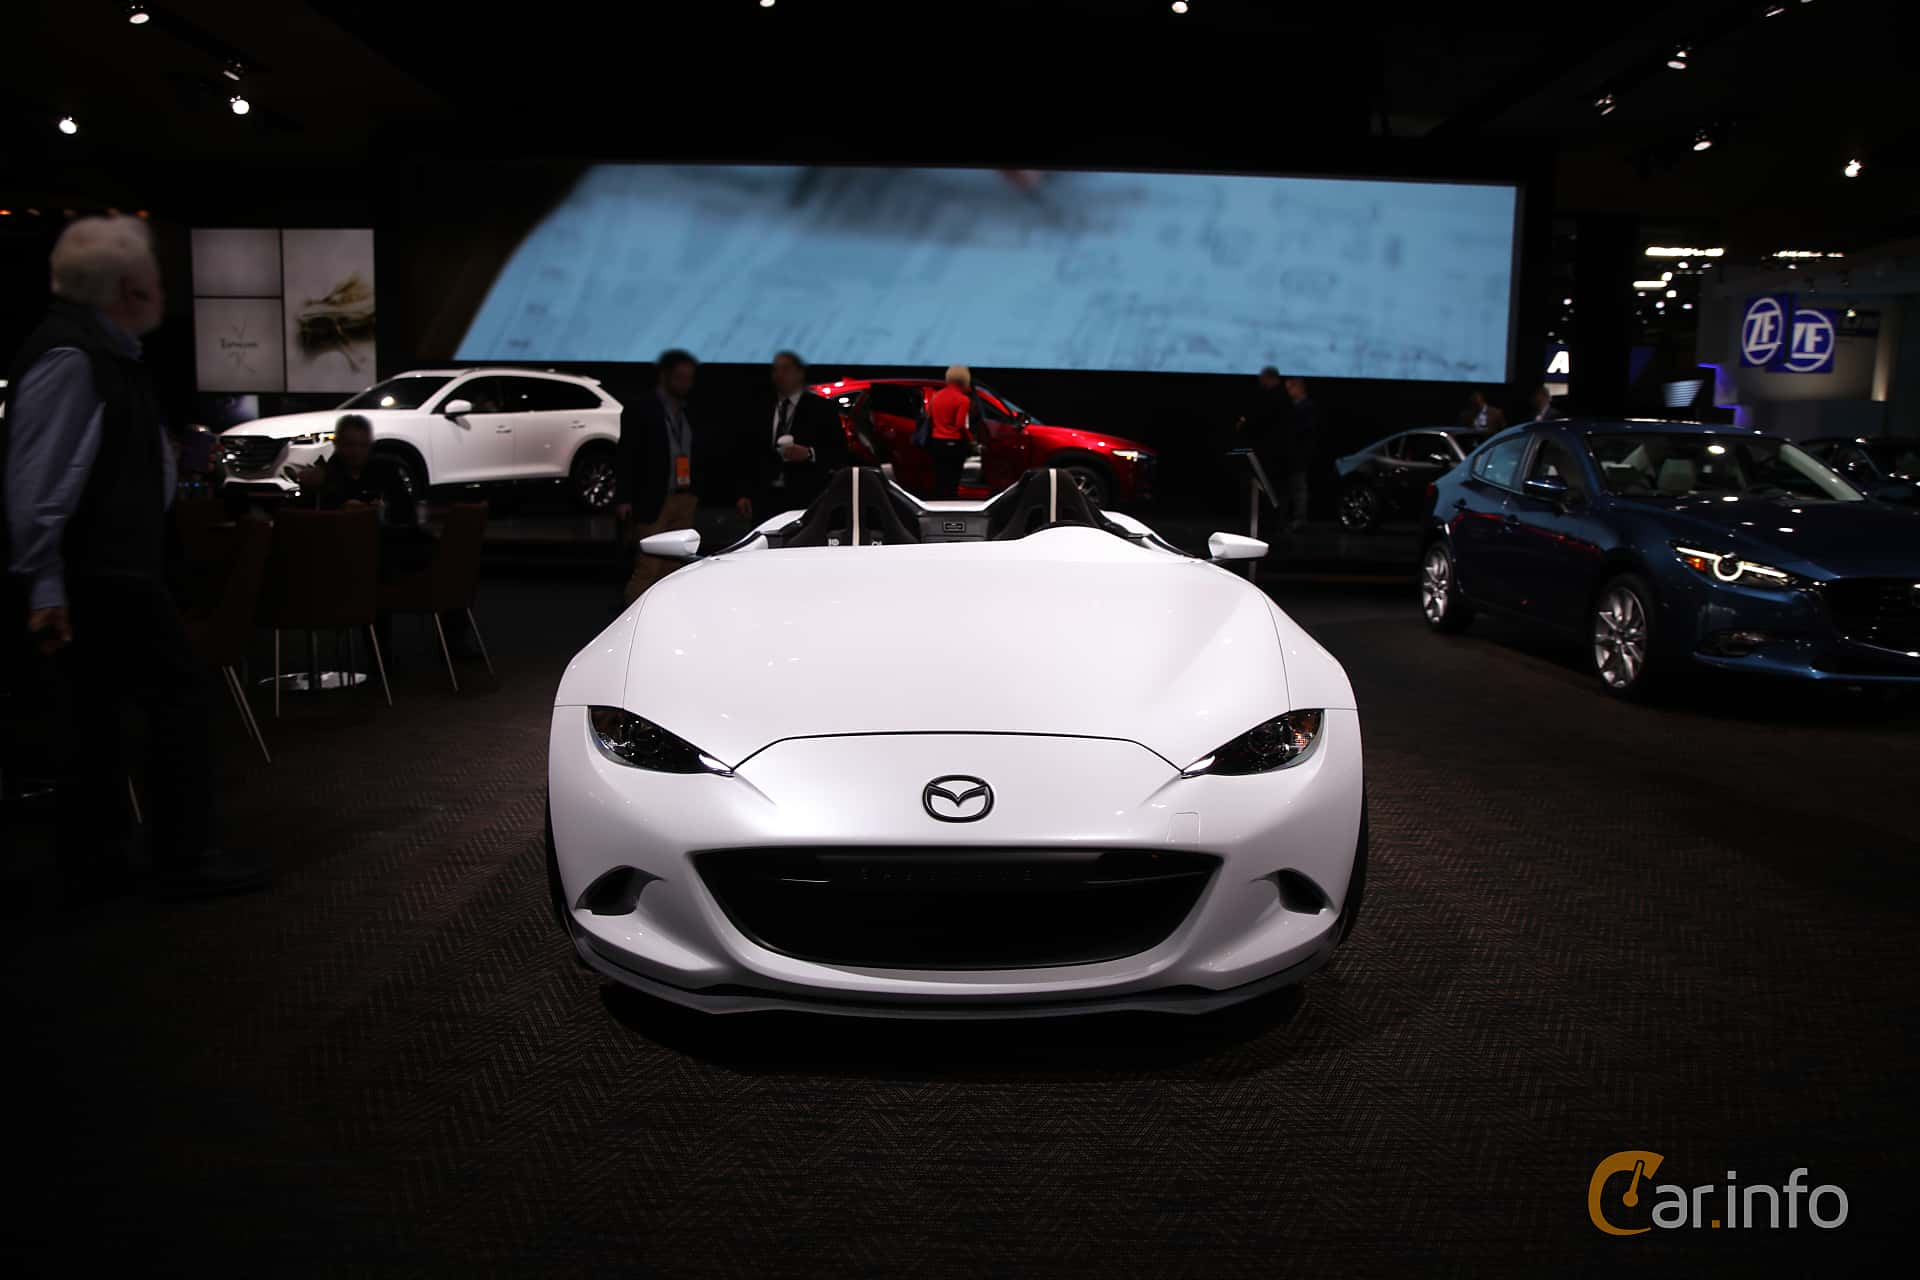 https://s.car.info/image_files/1920/mazda-mx-5-miata-speedster-evolution-front-north-american-international-auto-show-2017-2-318253.jpg